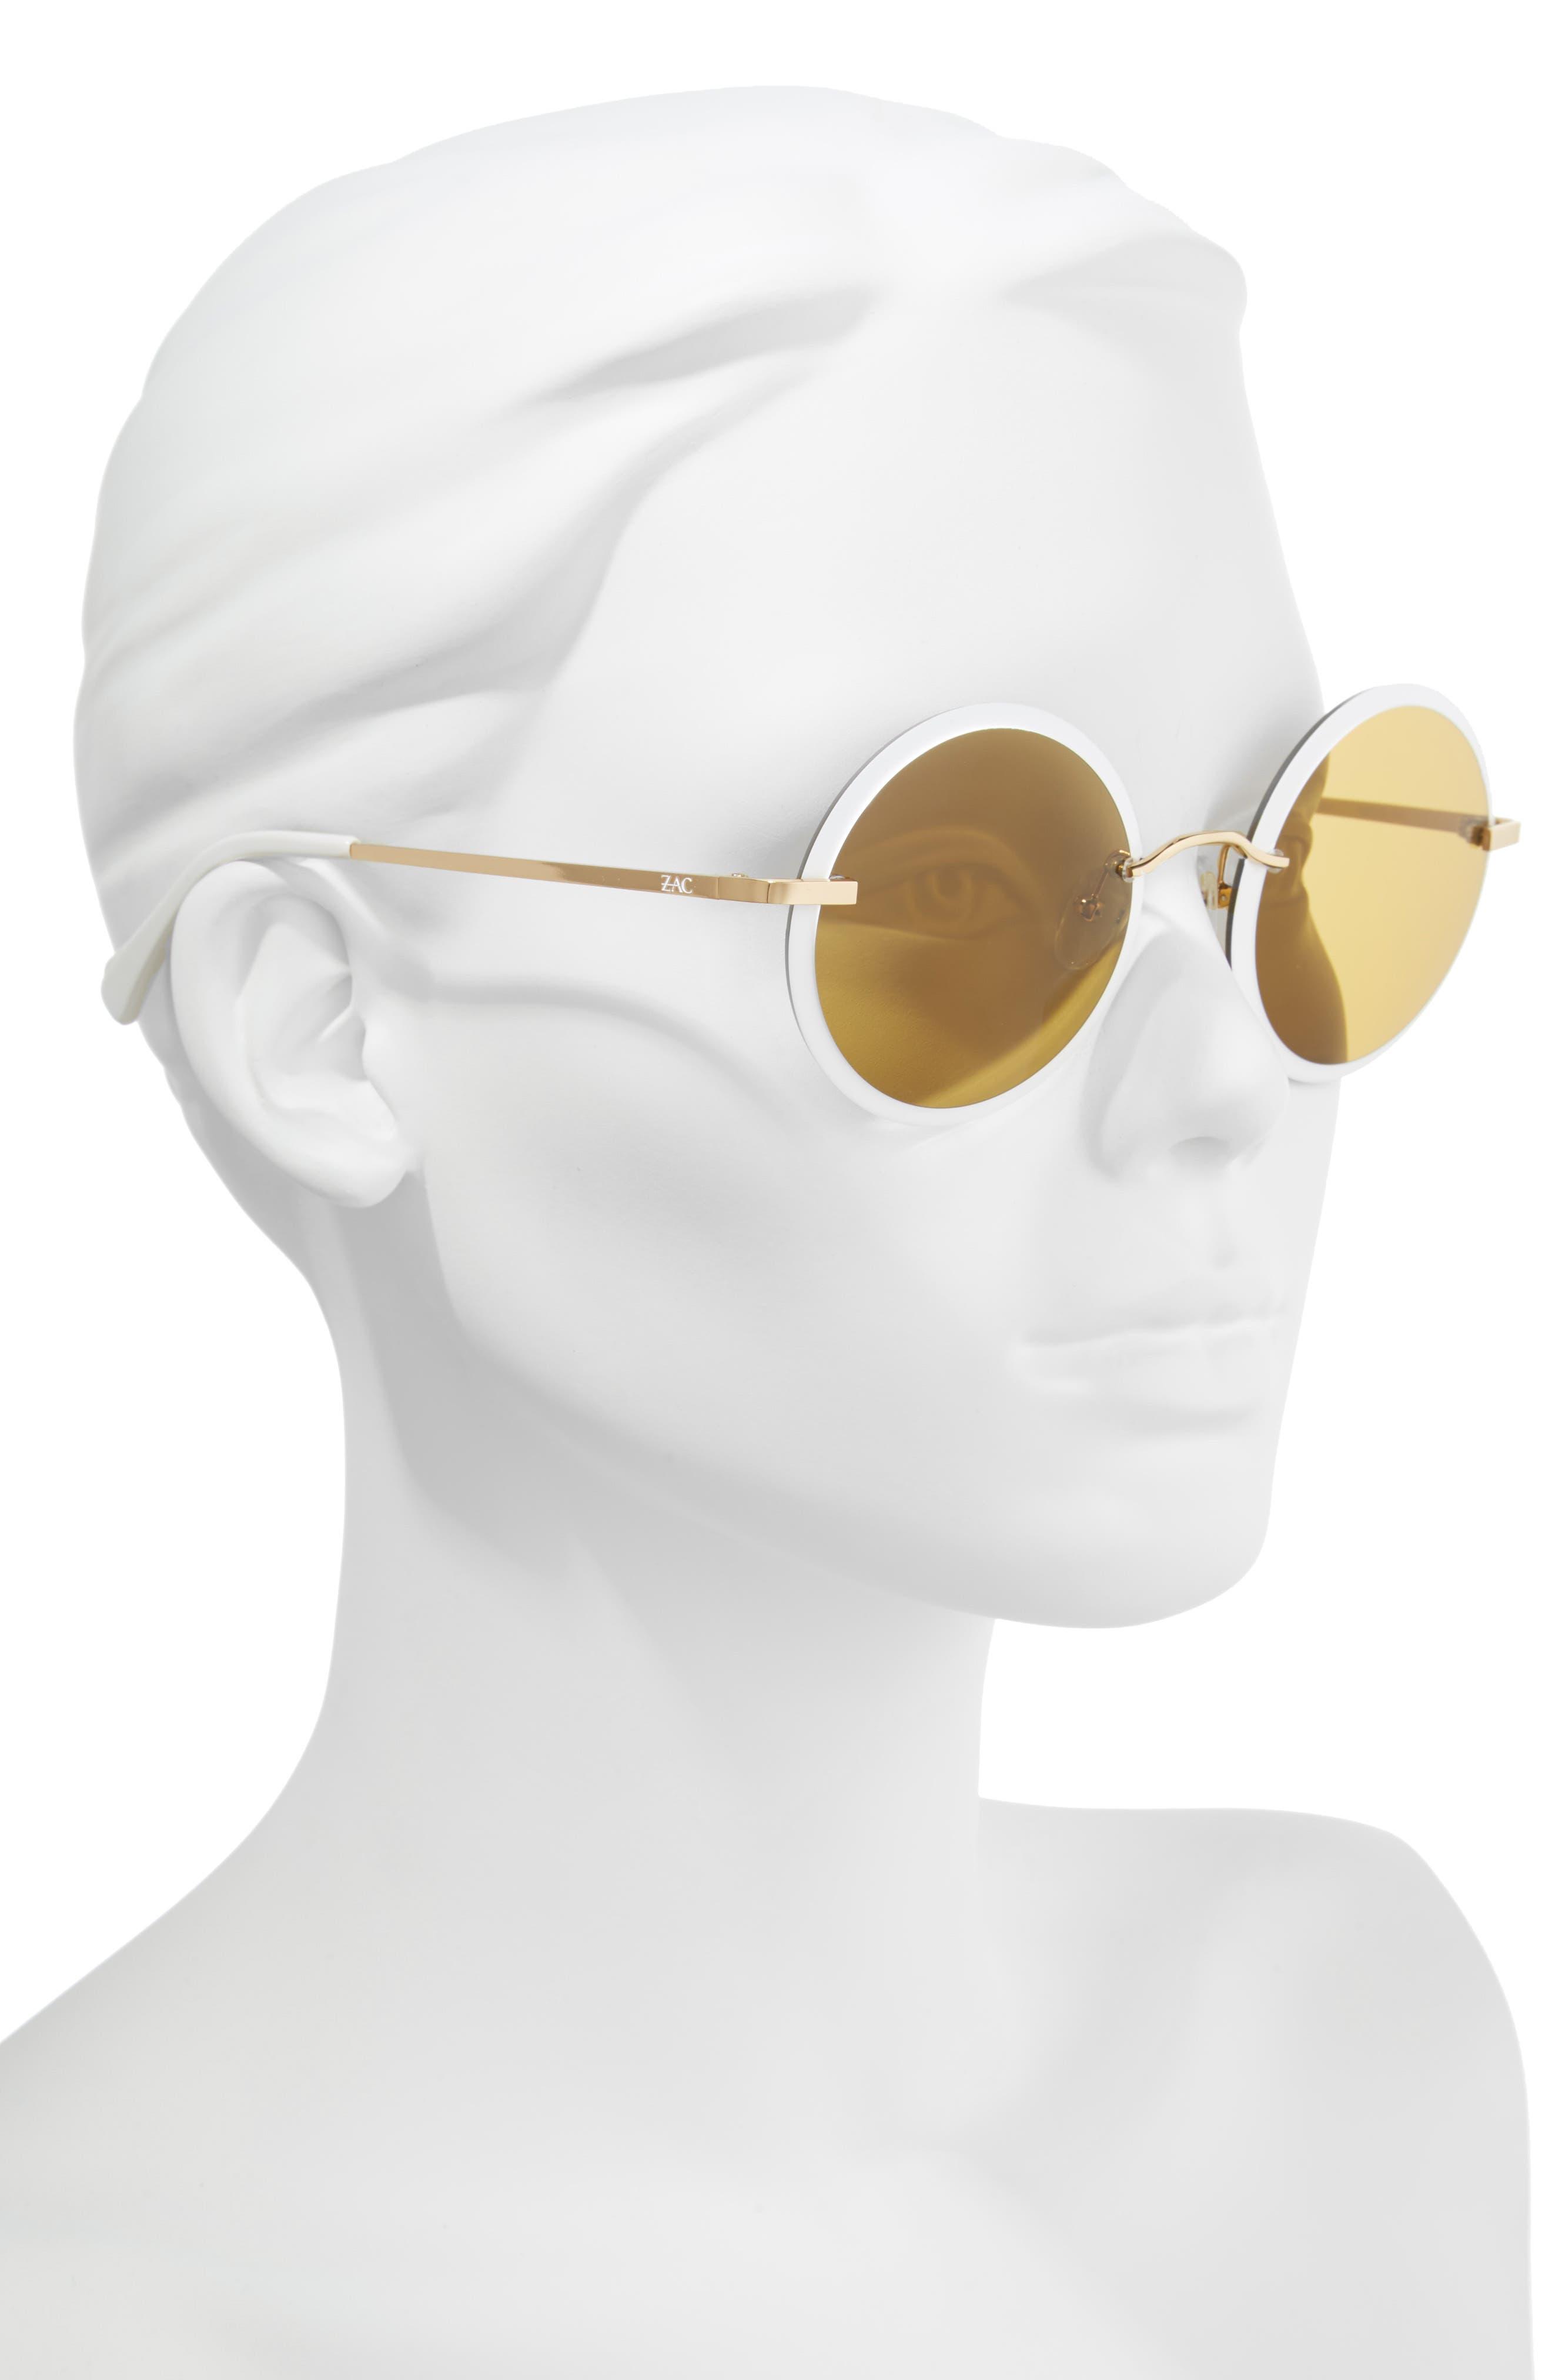 Dido 58mm Sunglasses,                             Alternate thumbnail 2, color,                             White/ Gold